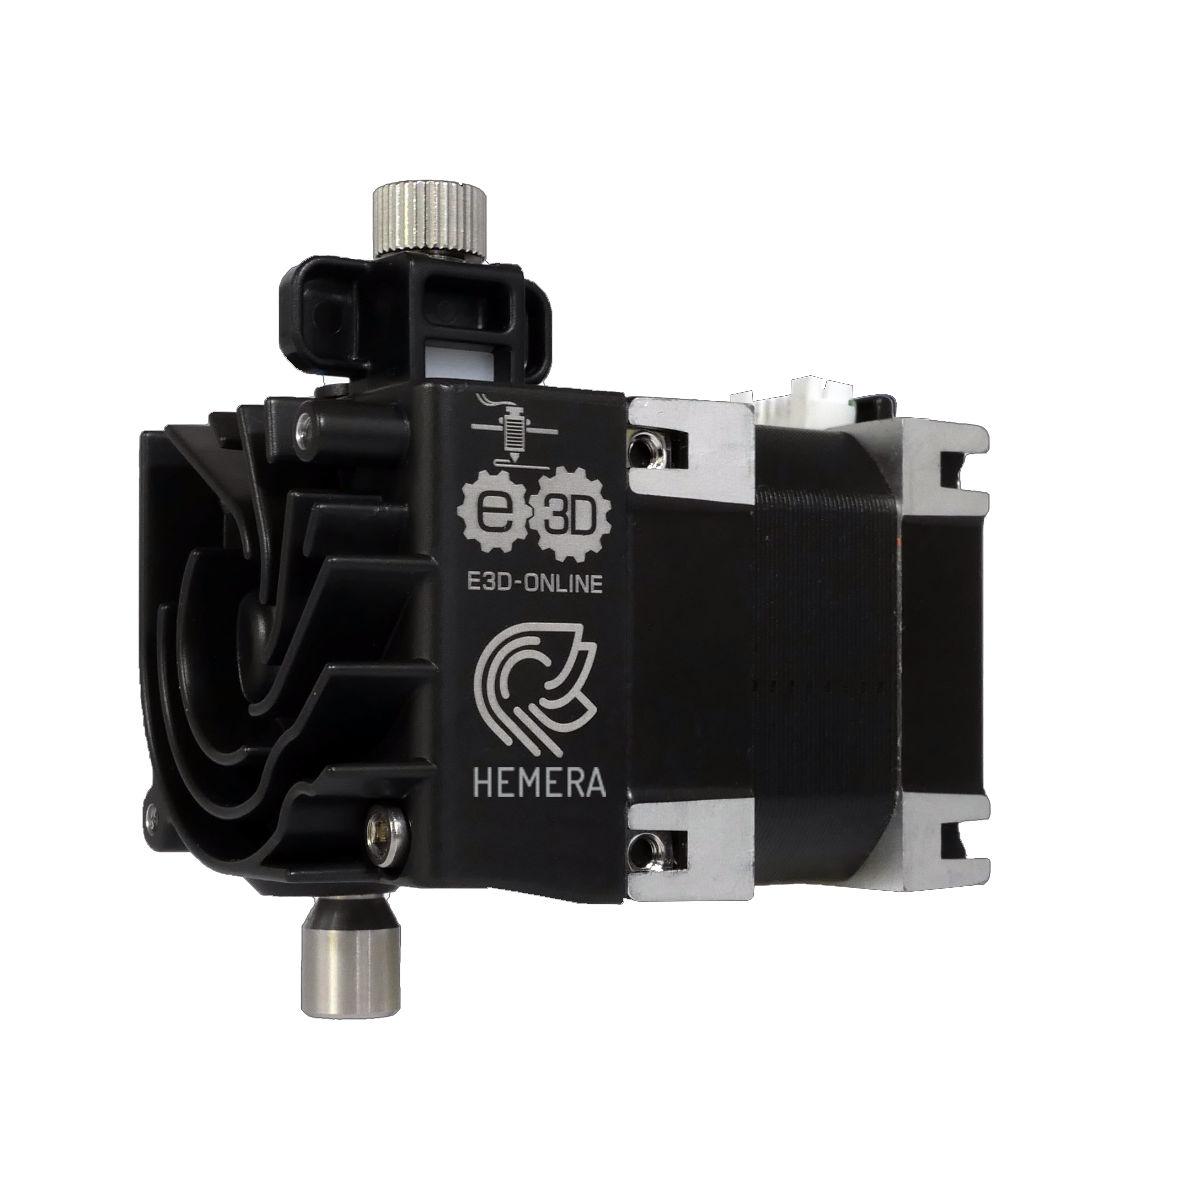 E3D Hemera Bowden Extruder Kit - 3D Printing Canada